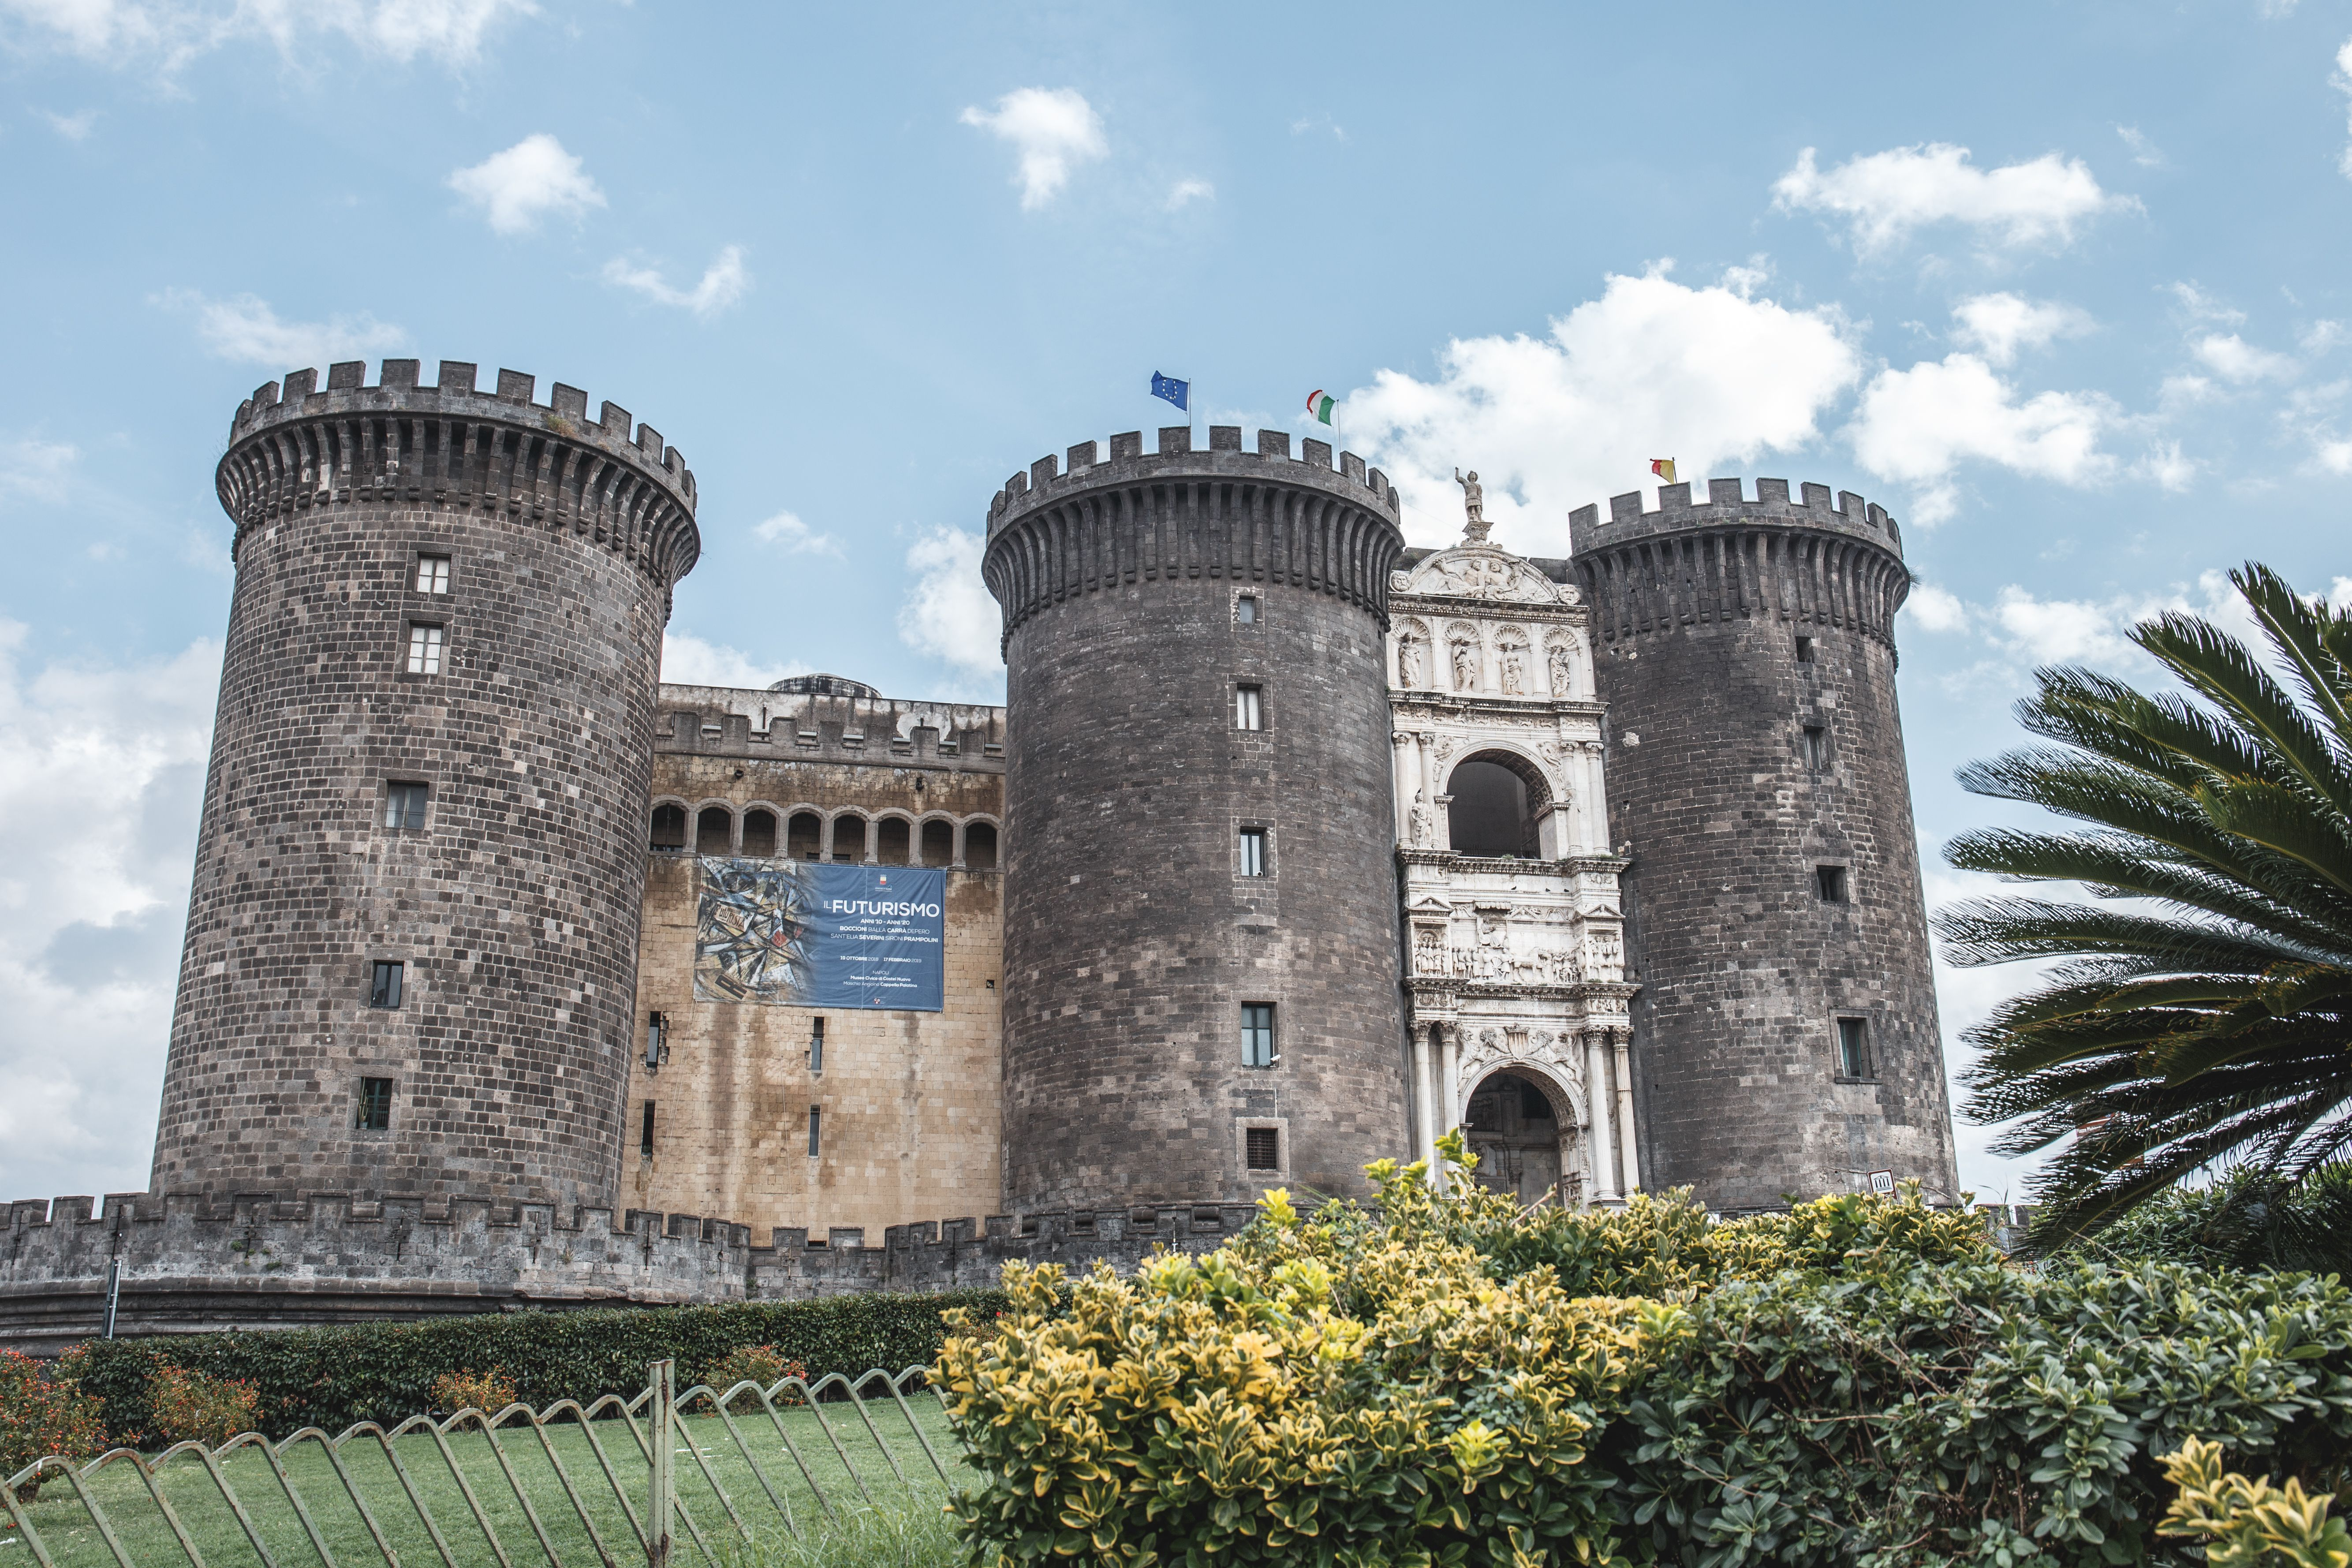 Castel-Nuovo-dallesterno.jpg